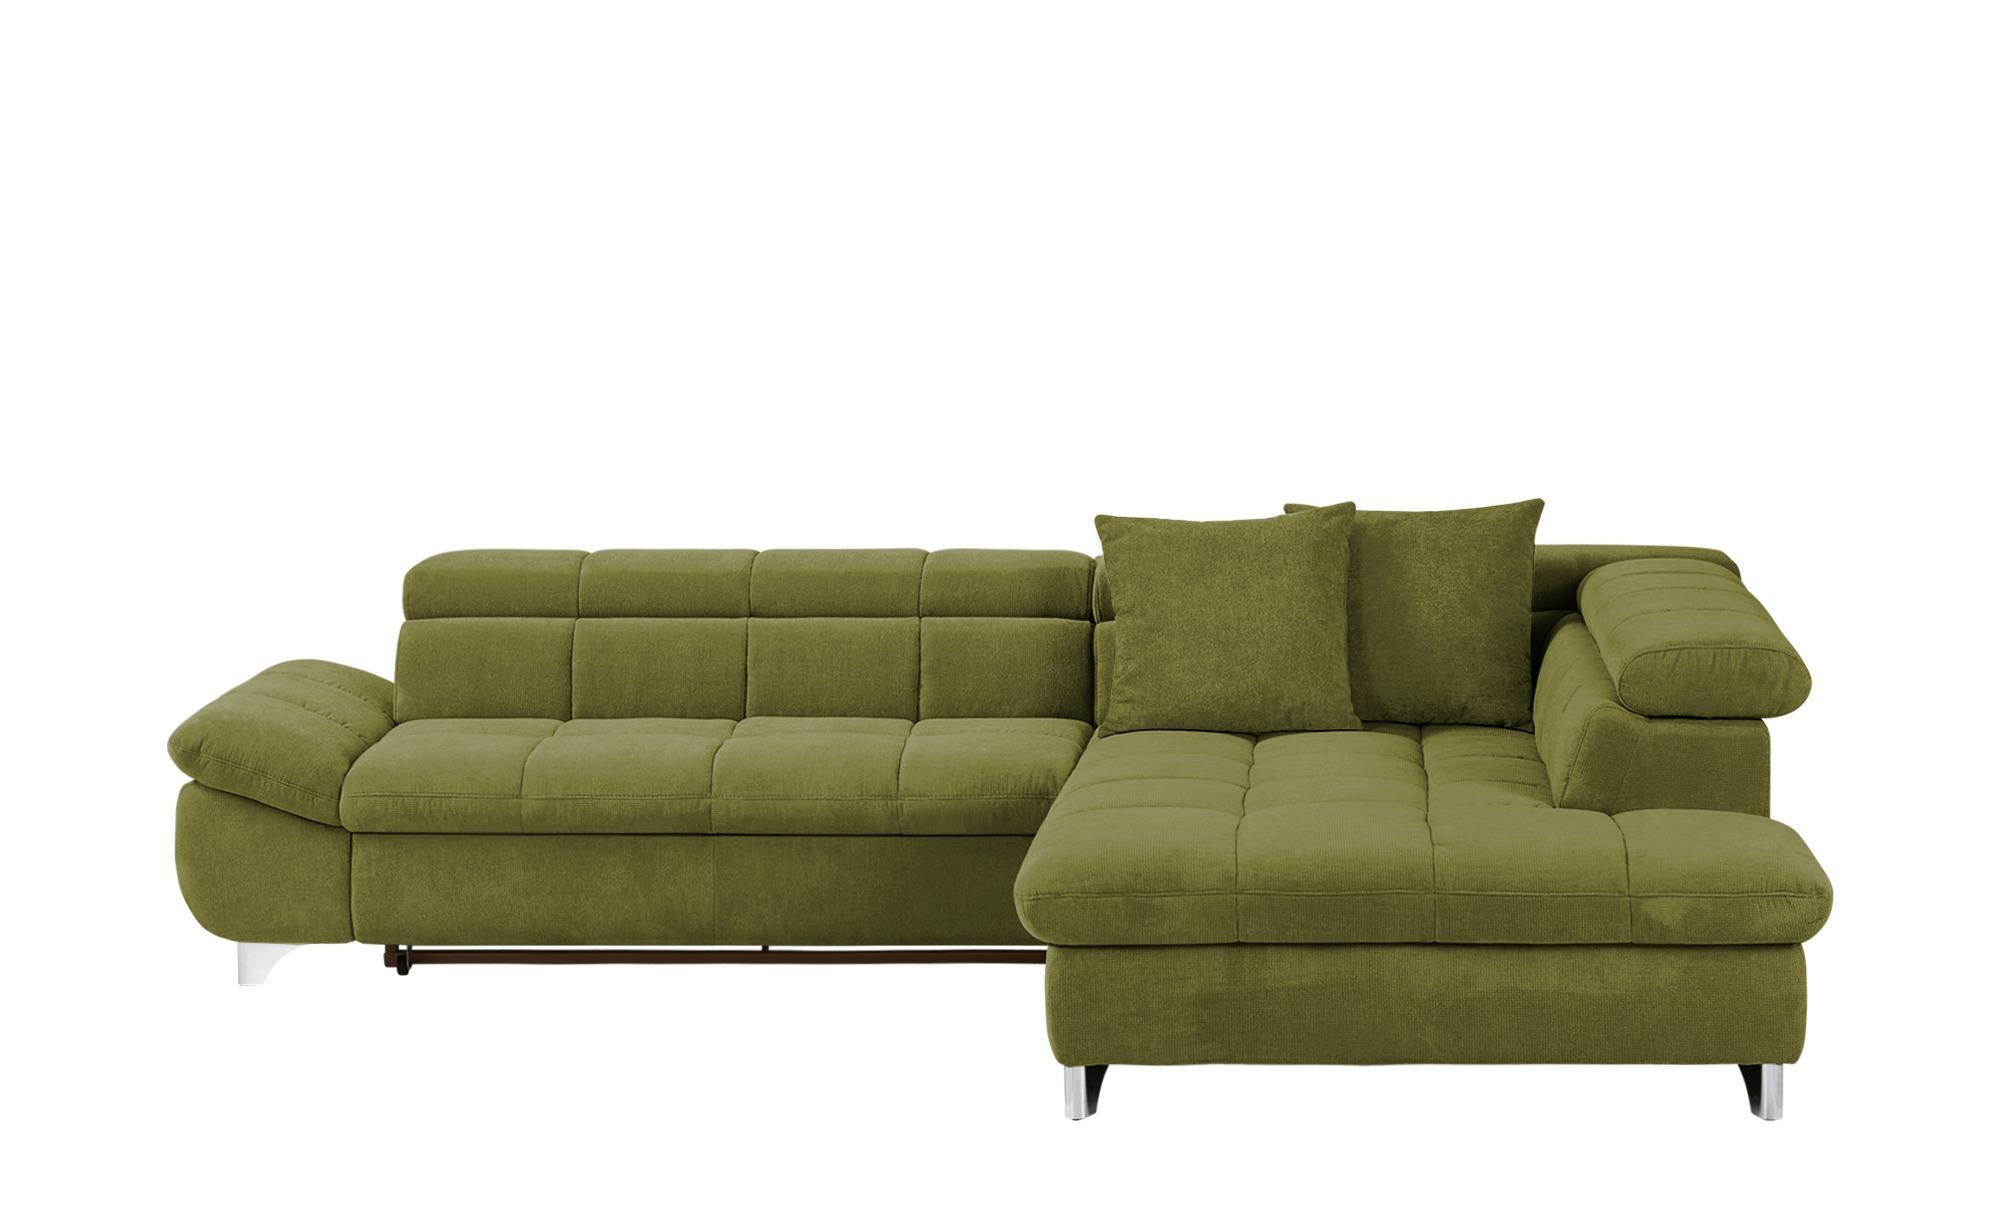 uno Ecksofa  Lorena ¦ grün ¦ Maße (cm): H: 79 Polstermöbel > Sofas > Ecksofas - Höffner